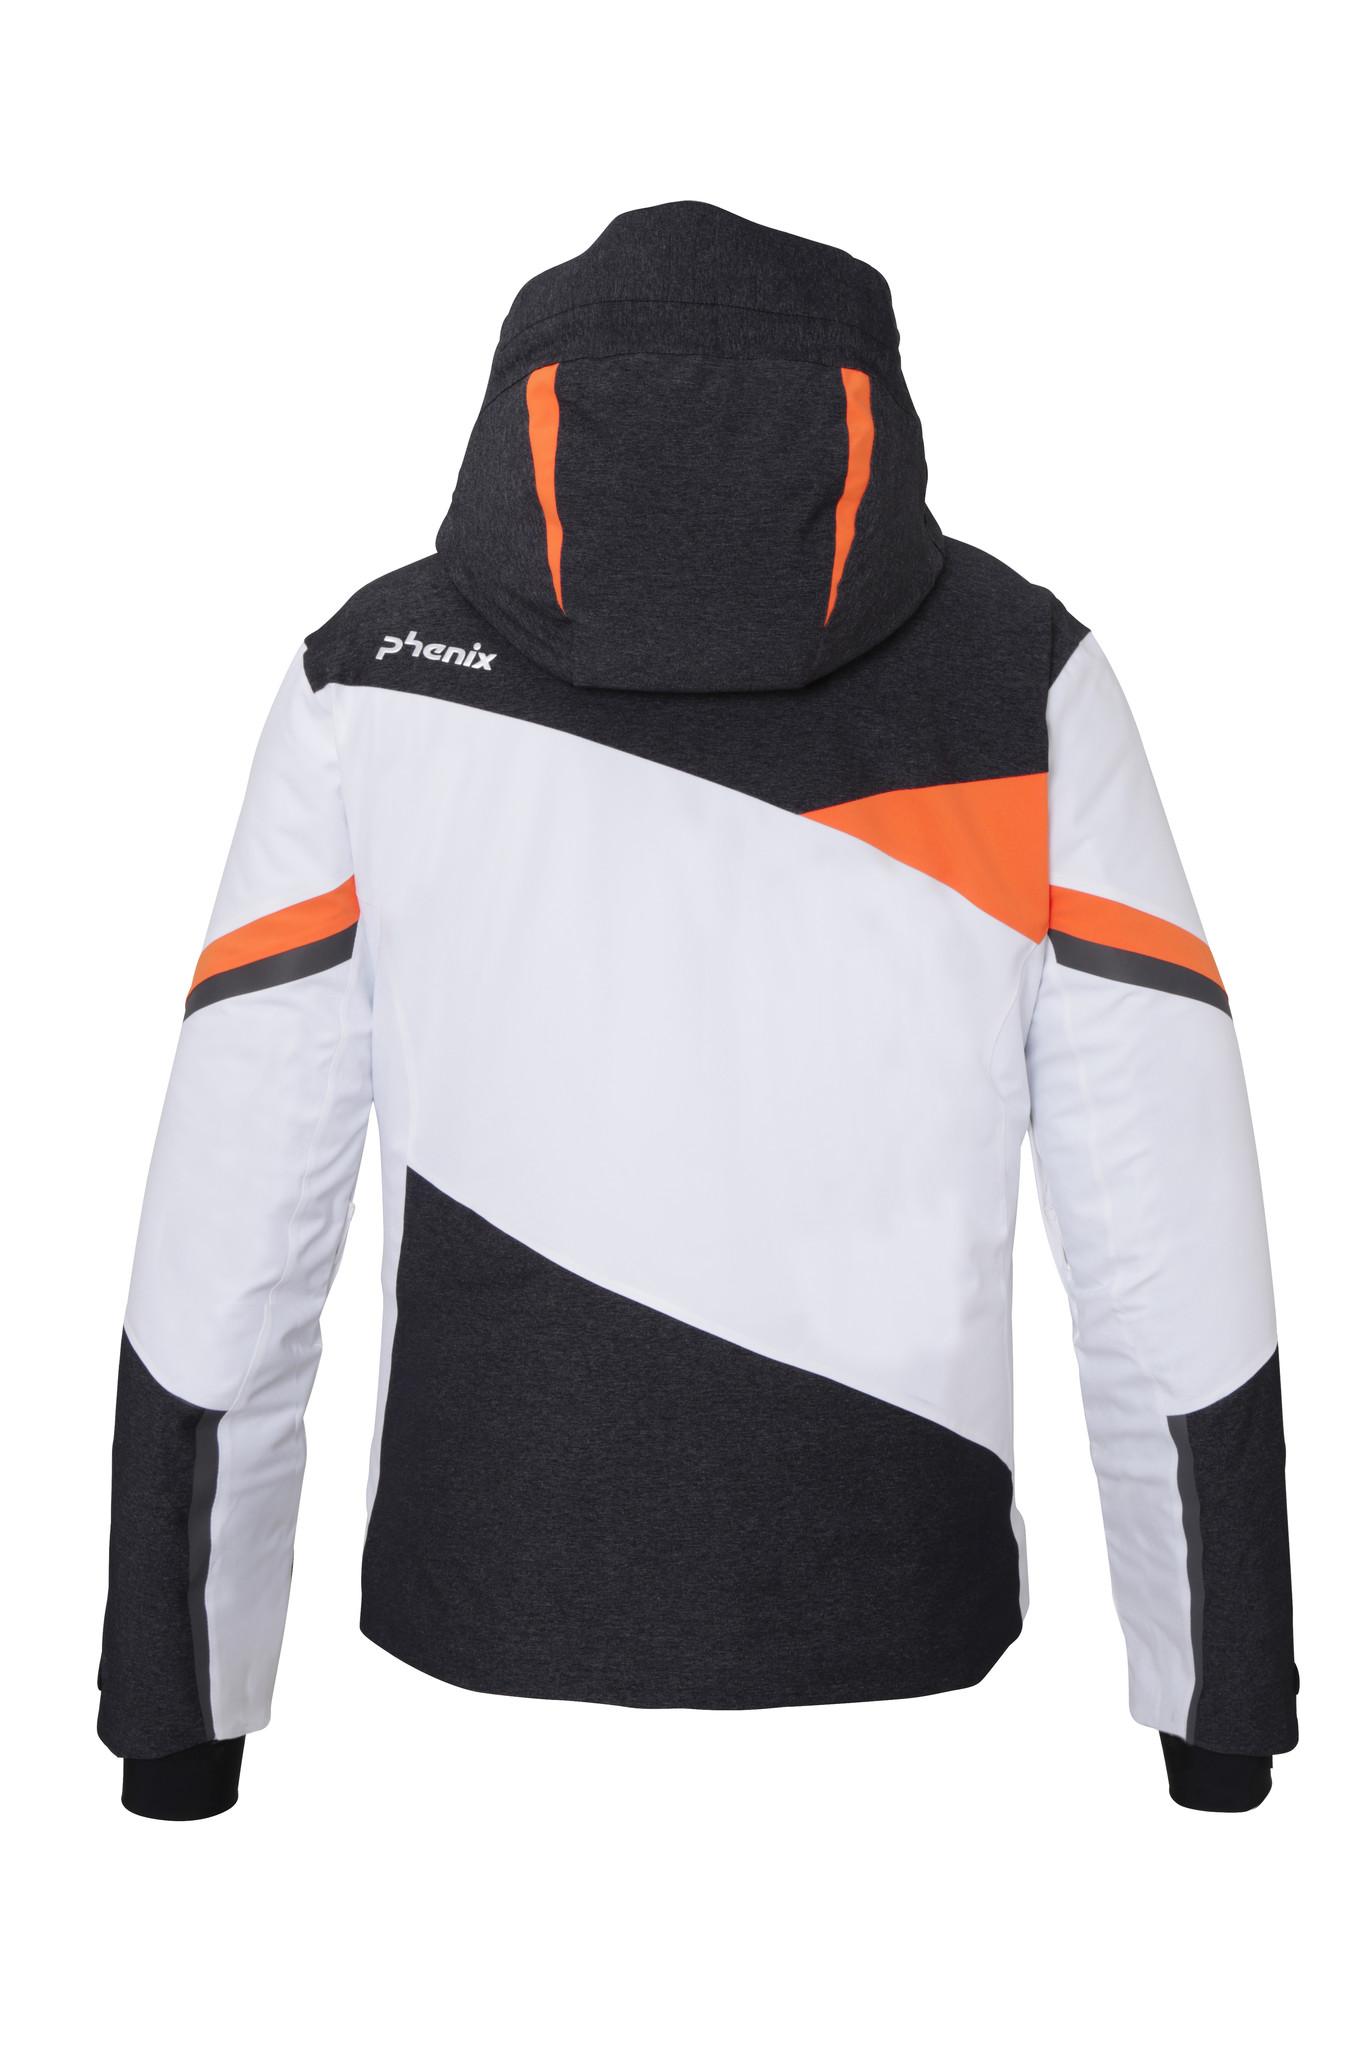 PHENIX Prism Jacket